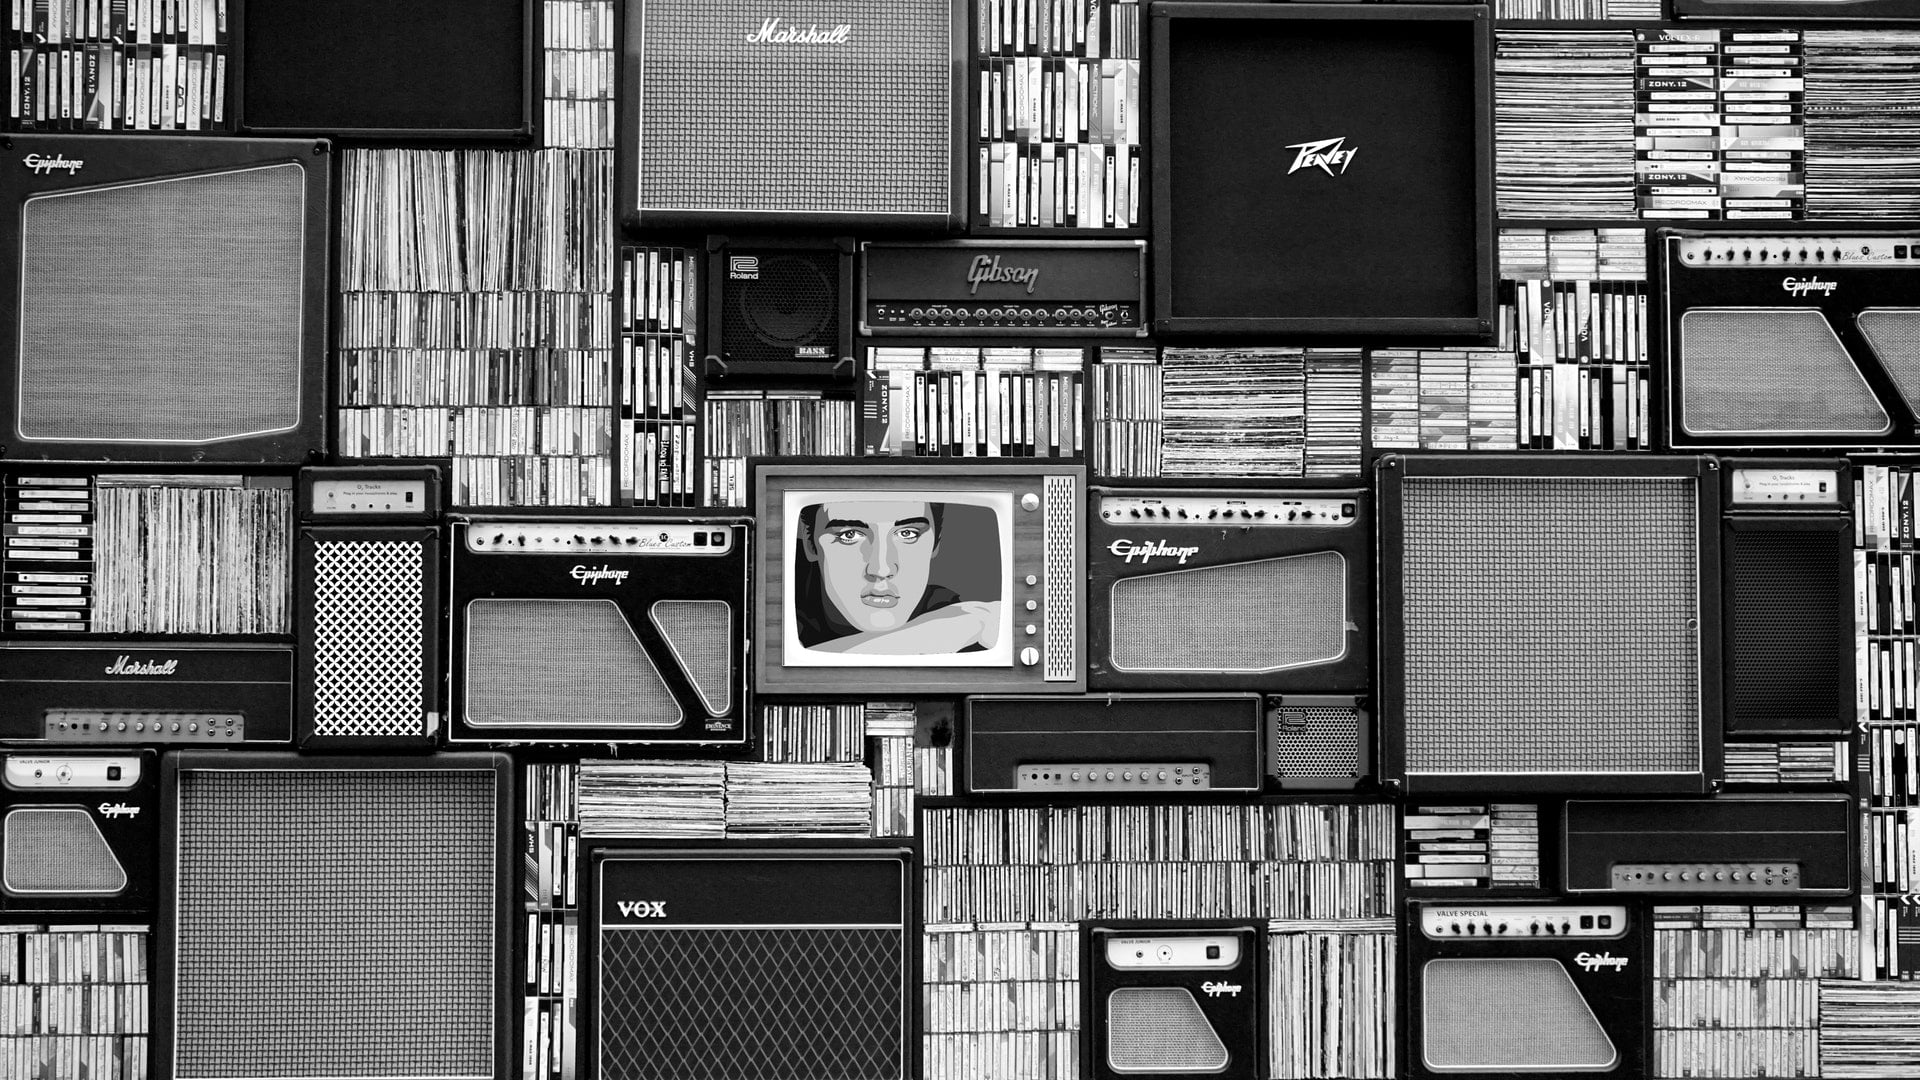 acoustic amplifier artist audio books box tv music type 1 1 手機科技|一行詩